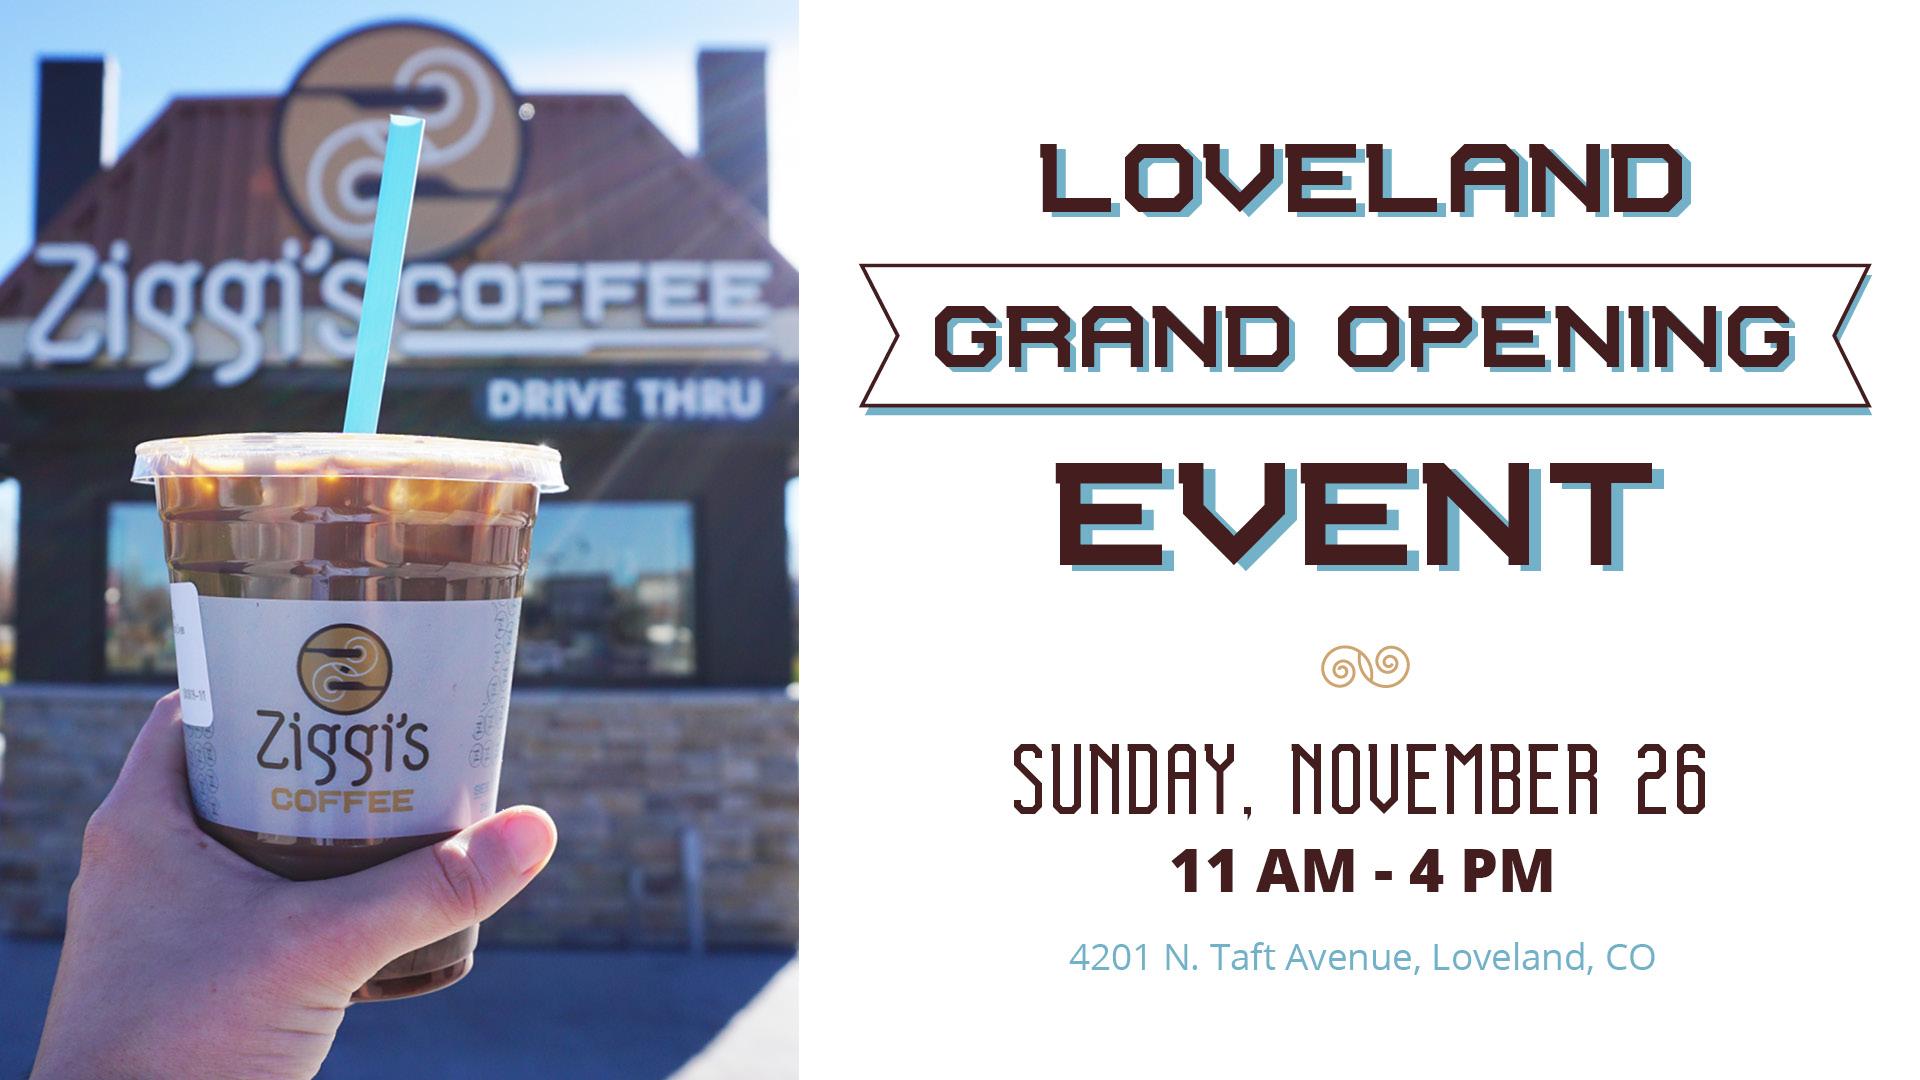 Ziggi's Coffee Loveland Grand Opening Event